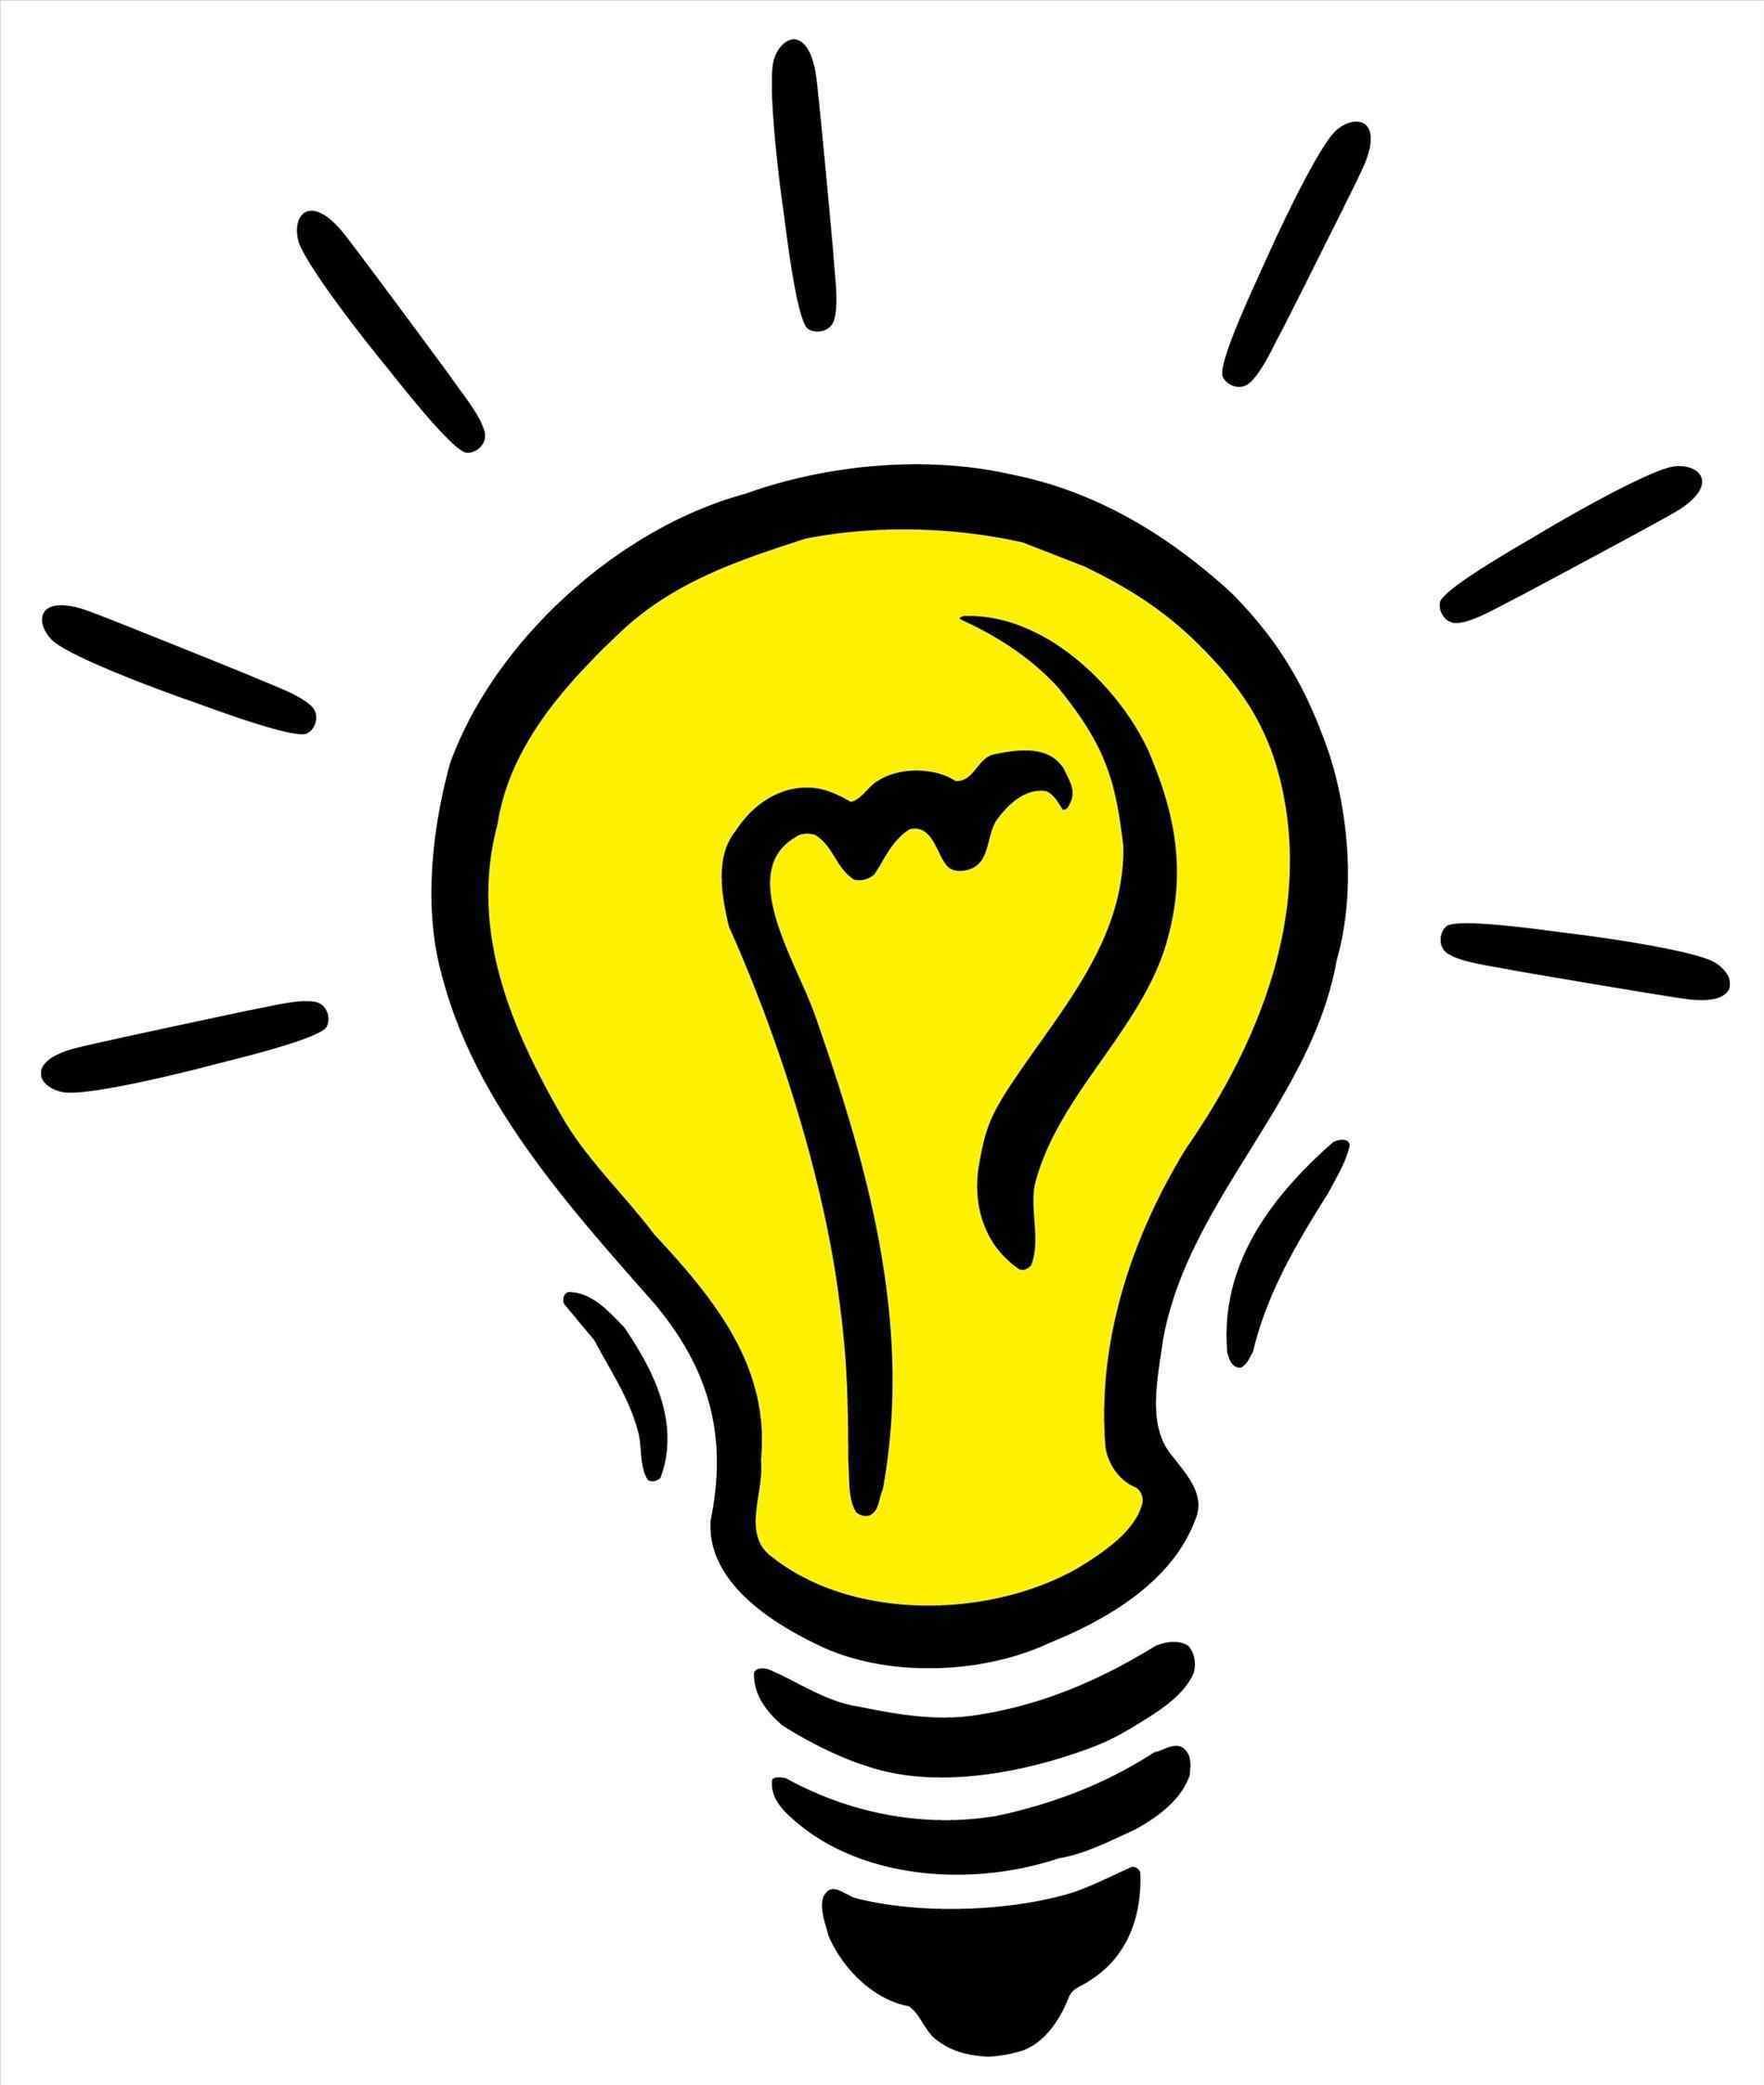 vector transparent download Light transparent free for. Lights clipart solution